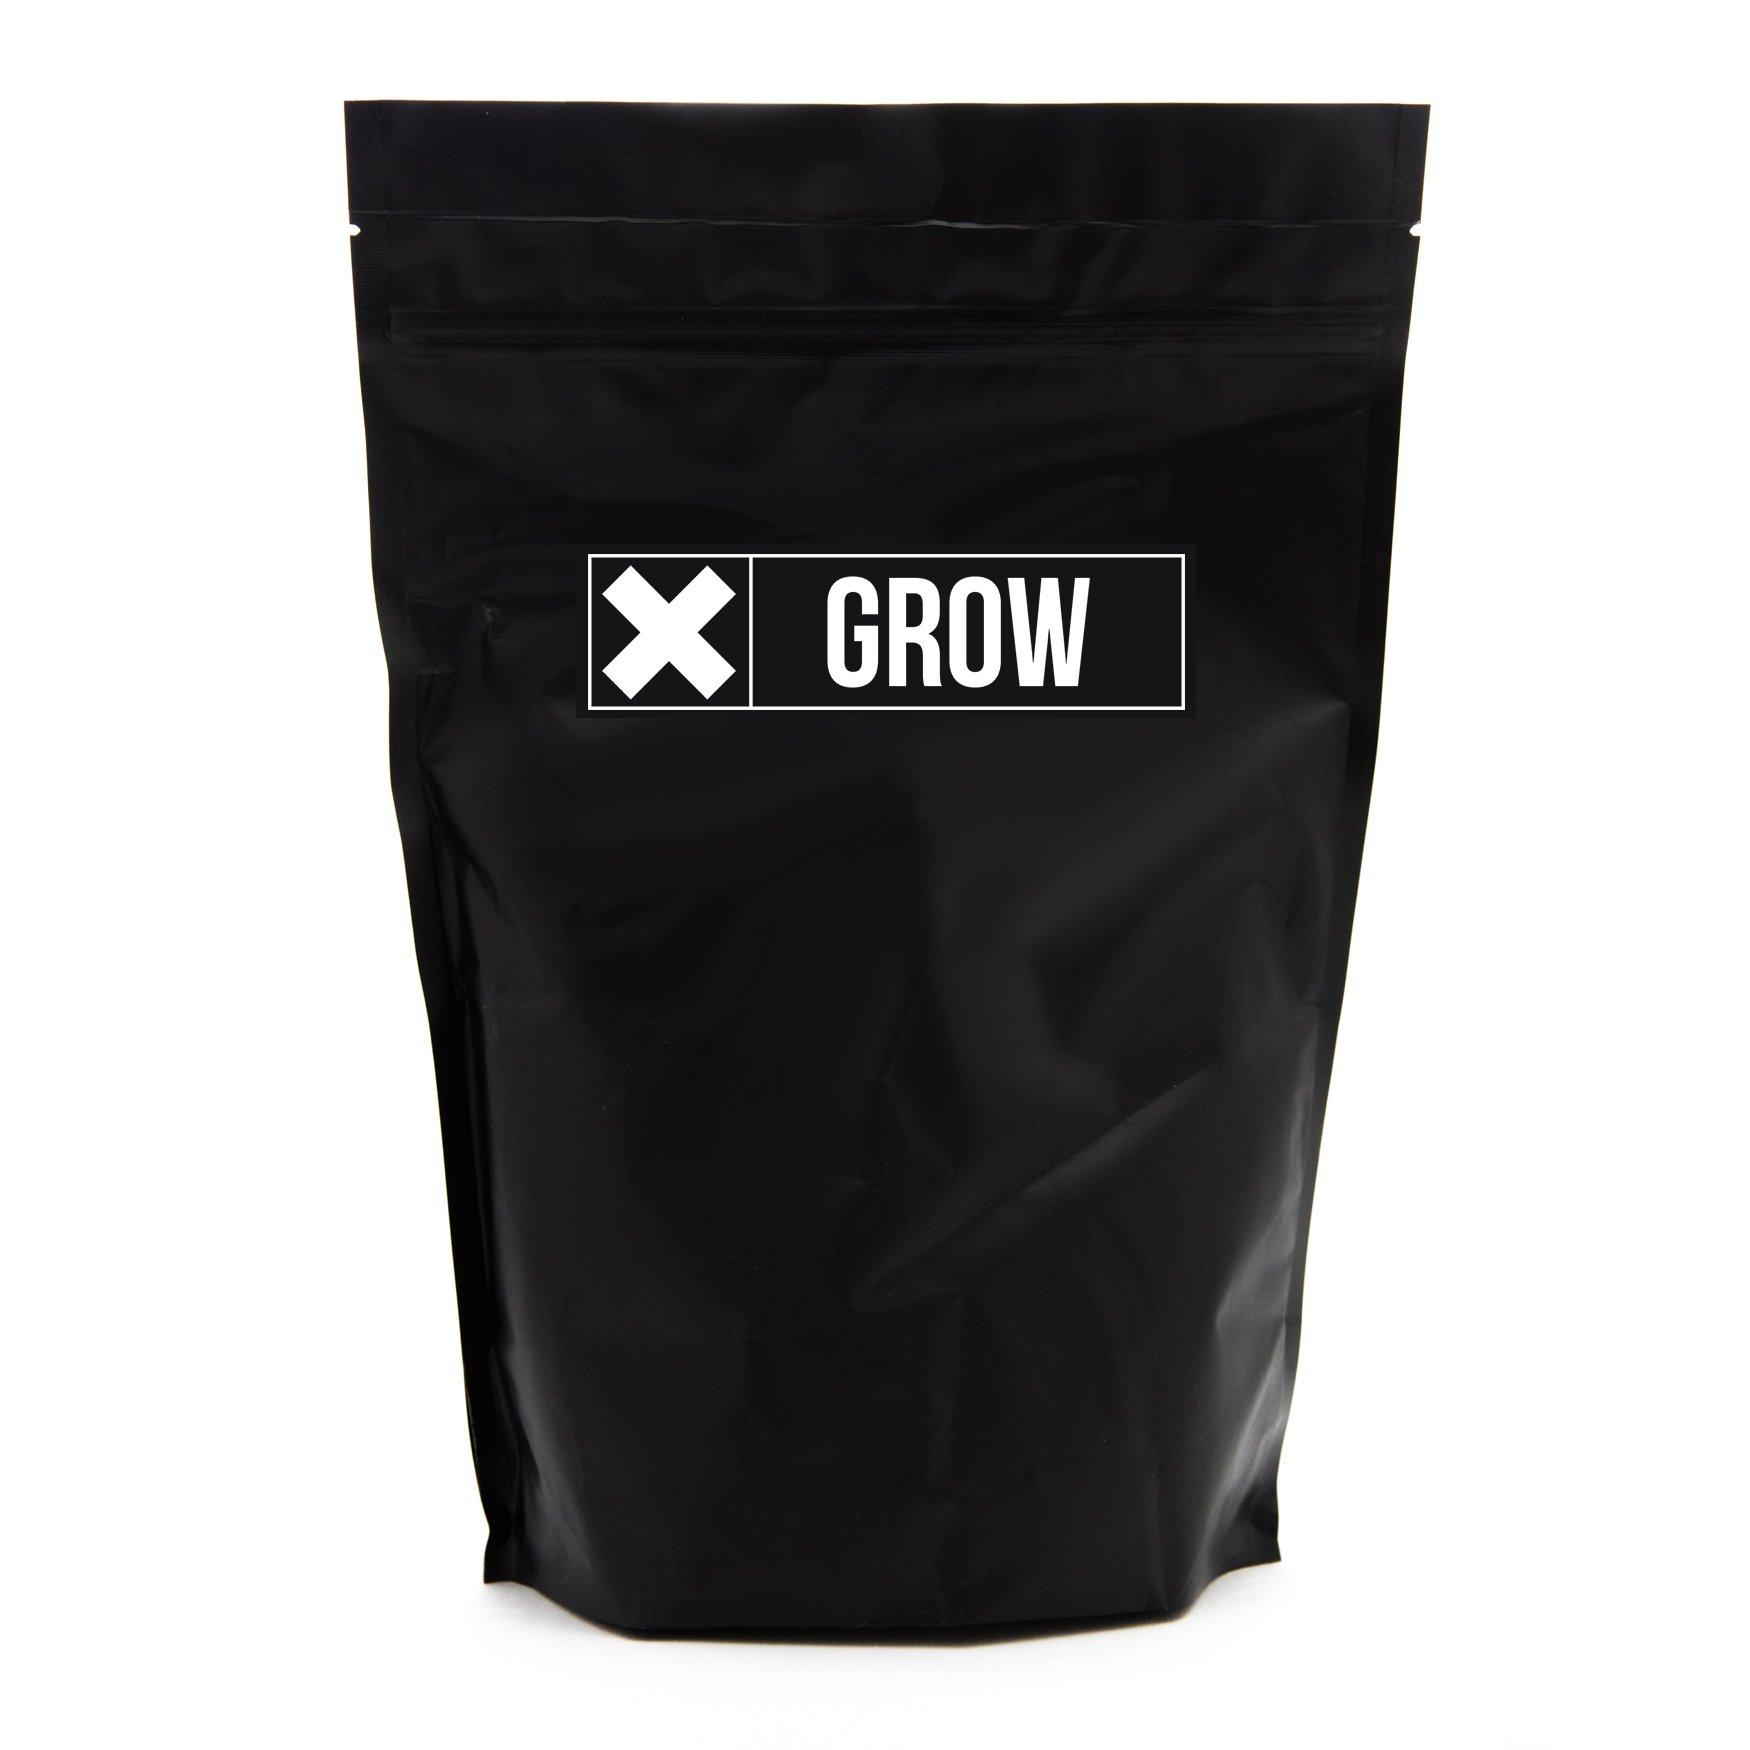 Xwerks Grow - New Zealand Grass Fed Whey Protein Powder Isolate (Vanilla Victory)